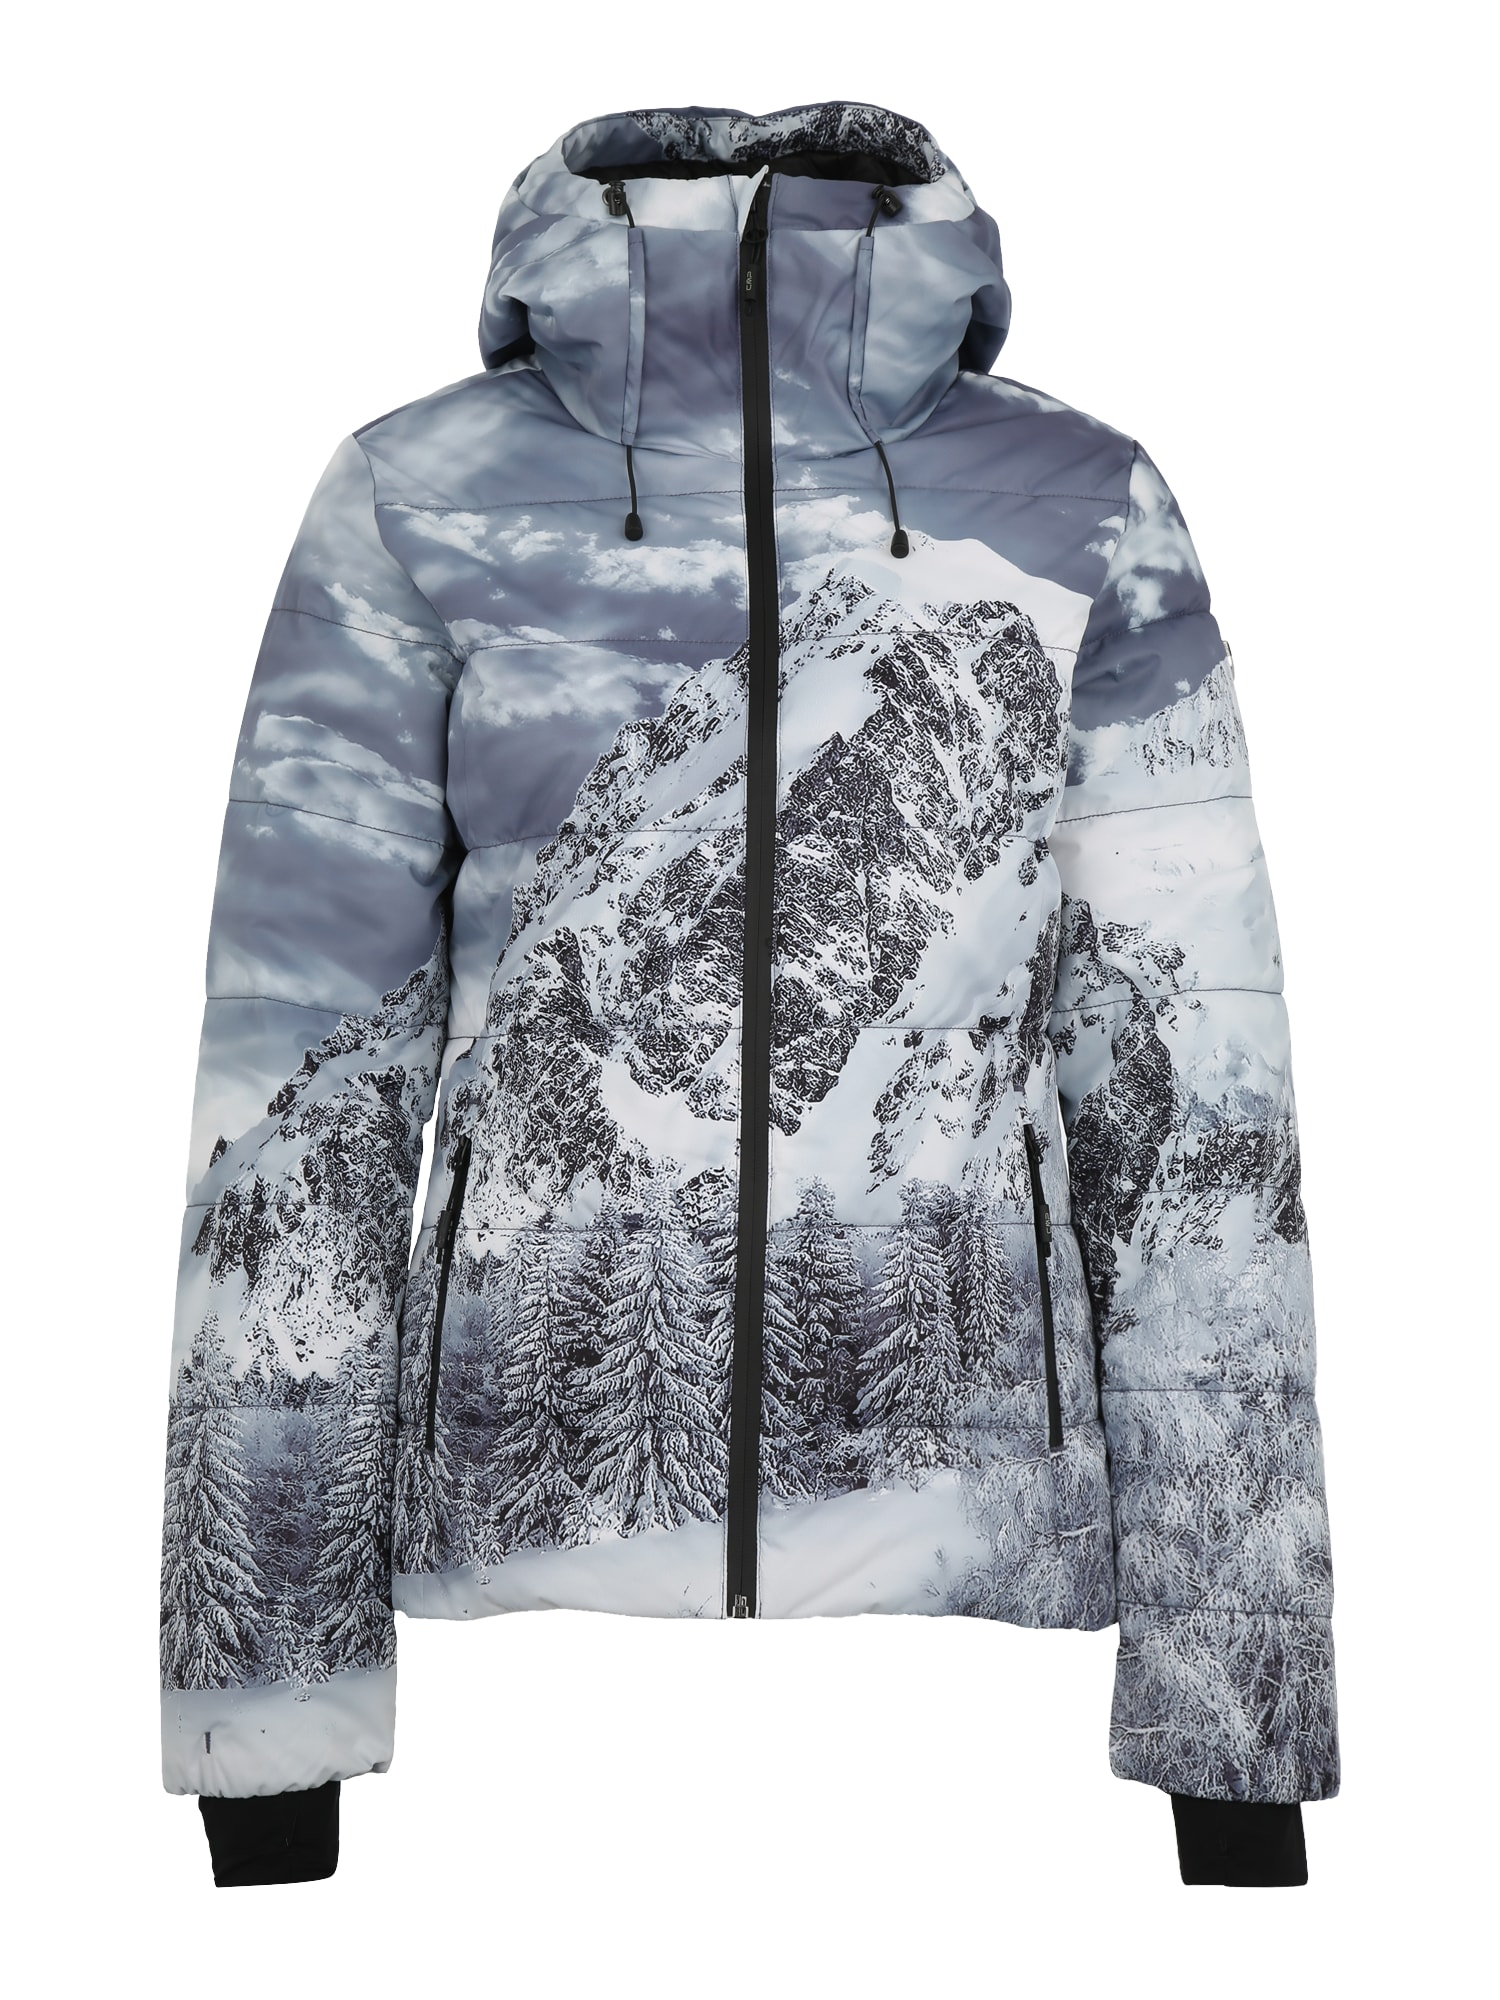 Outdoorová bunda tmavě šedá CMP